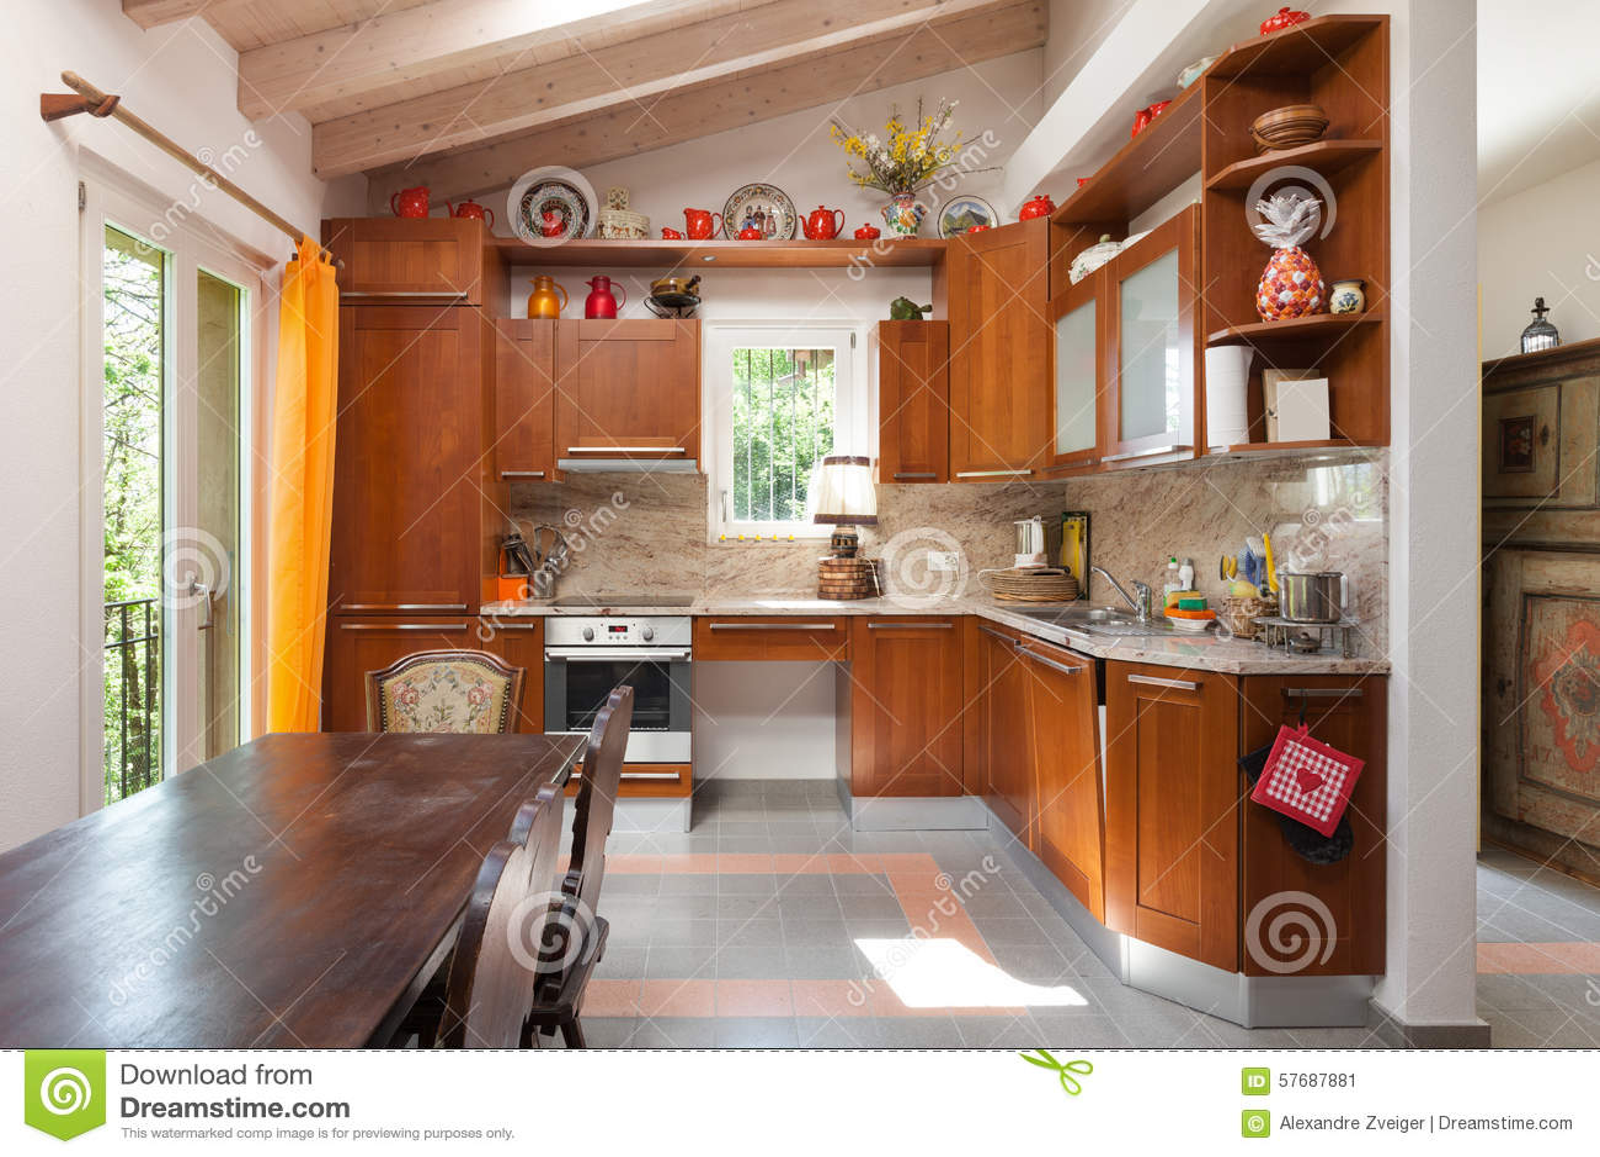 Cucine campagna gallery of casa vacanza campagna sicilia for Cucina di campagna inglese